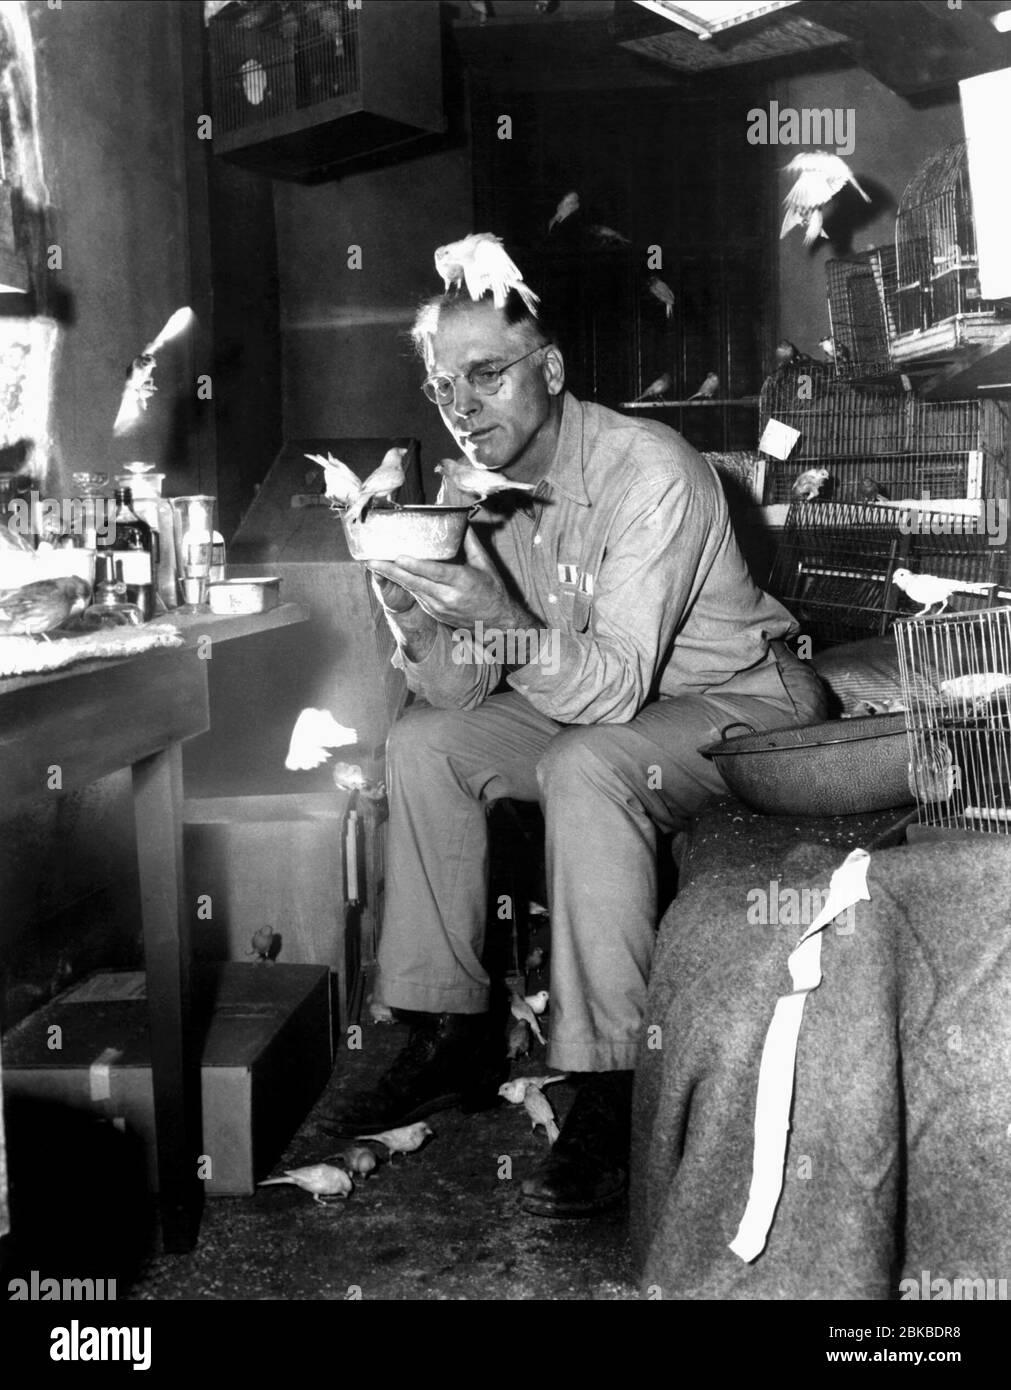 BURT LANCASTER, THE BIRDMAN OF ALCATRAZ, 1962 Stock Photo